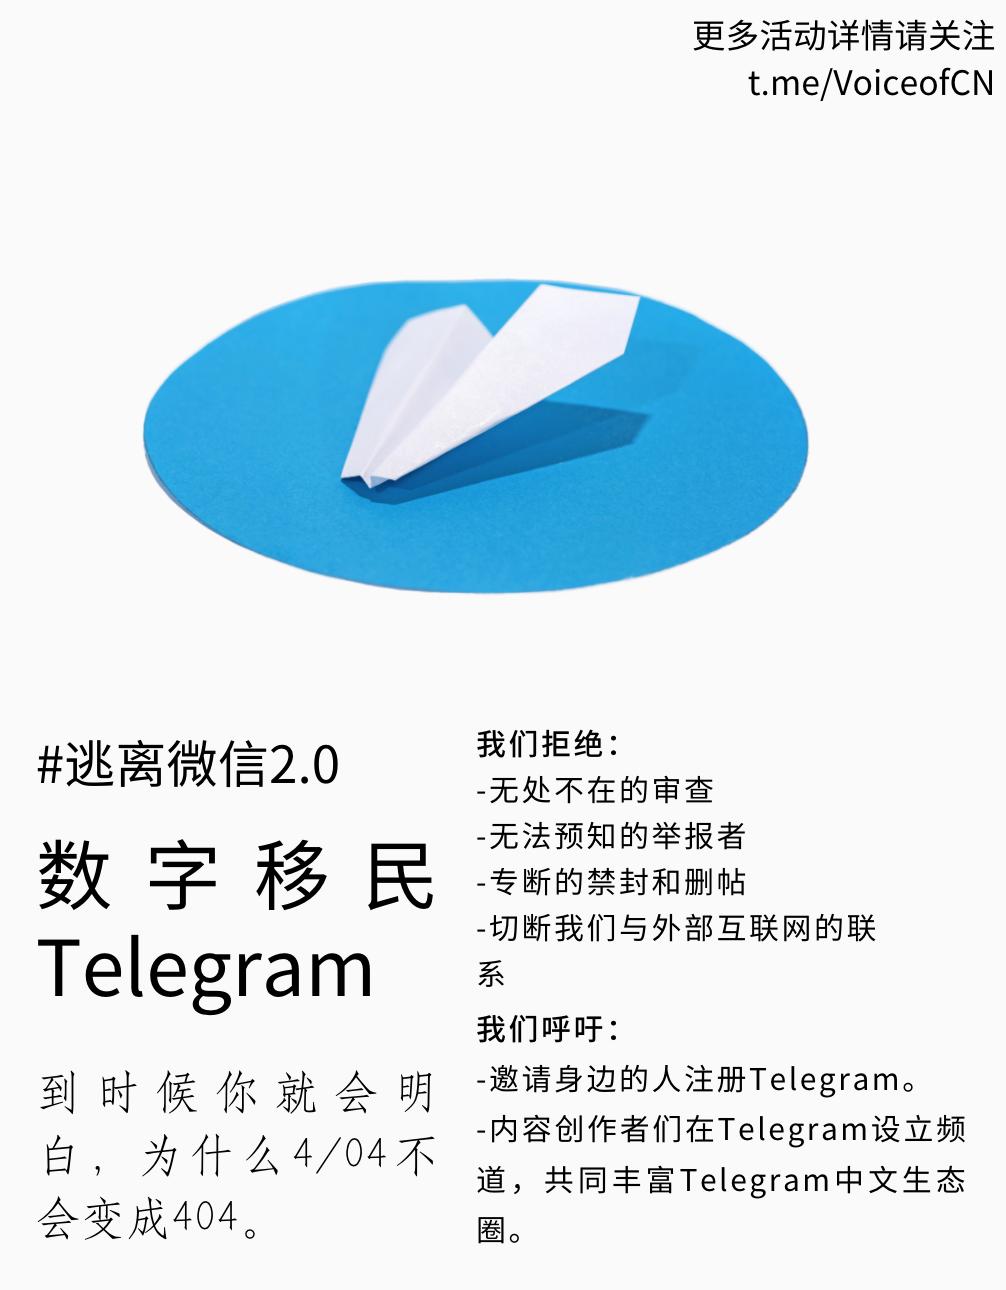 https://telegra.ph/file/66d6fefbf02efb6f89cb6.png